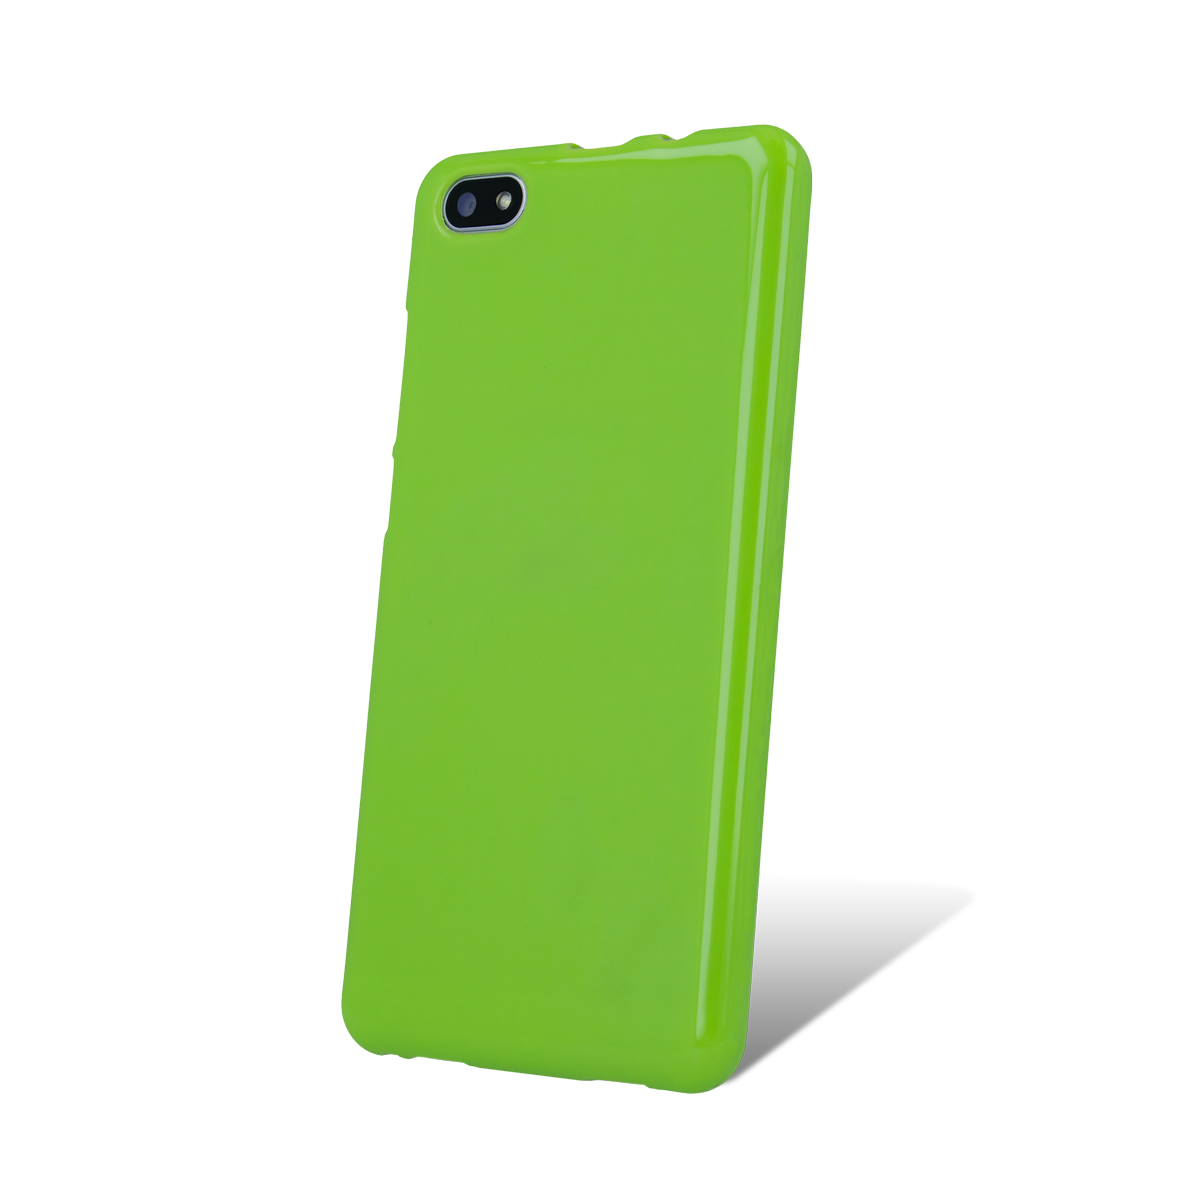 SILIKONOVÉ (TPU) POUZDRO ZELENÉ PRO myPhone PRIME 2